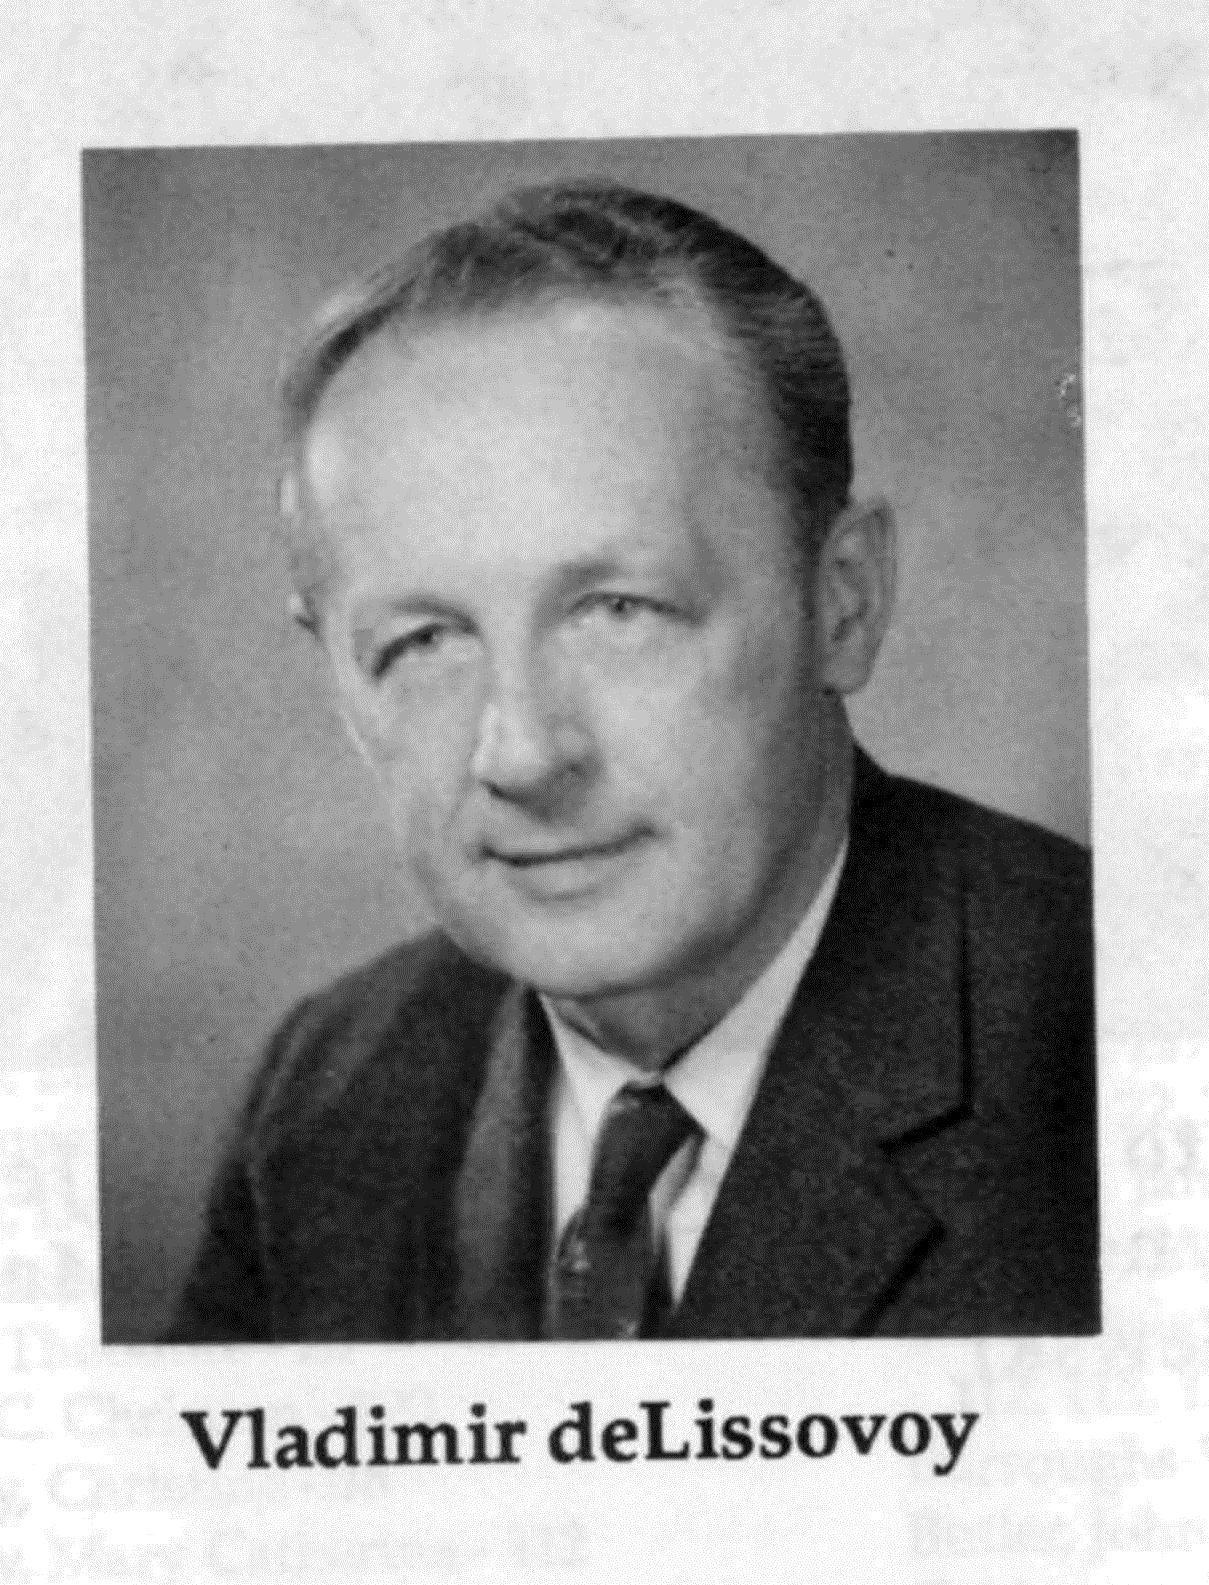 Vladimir de Lissovoy